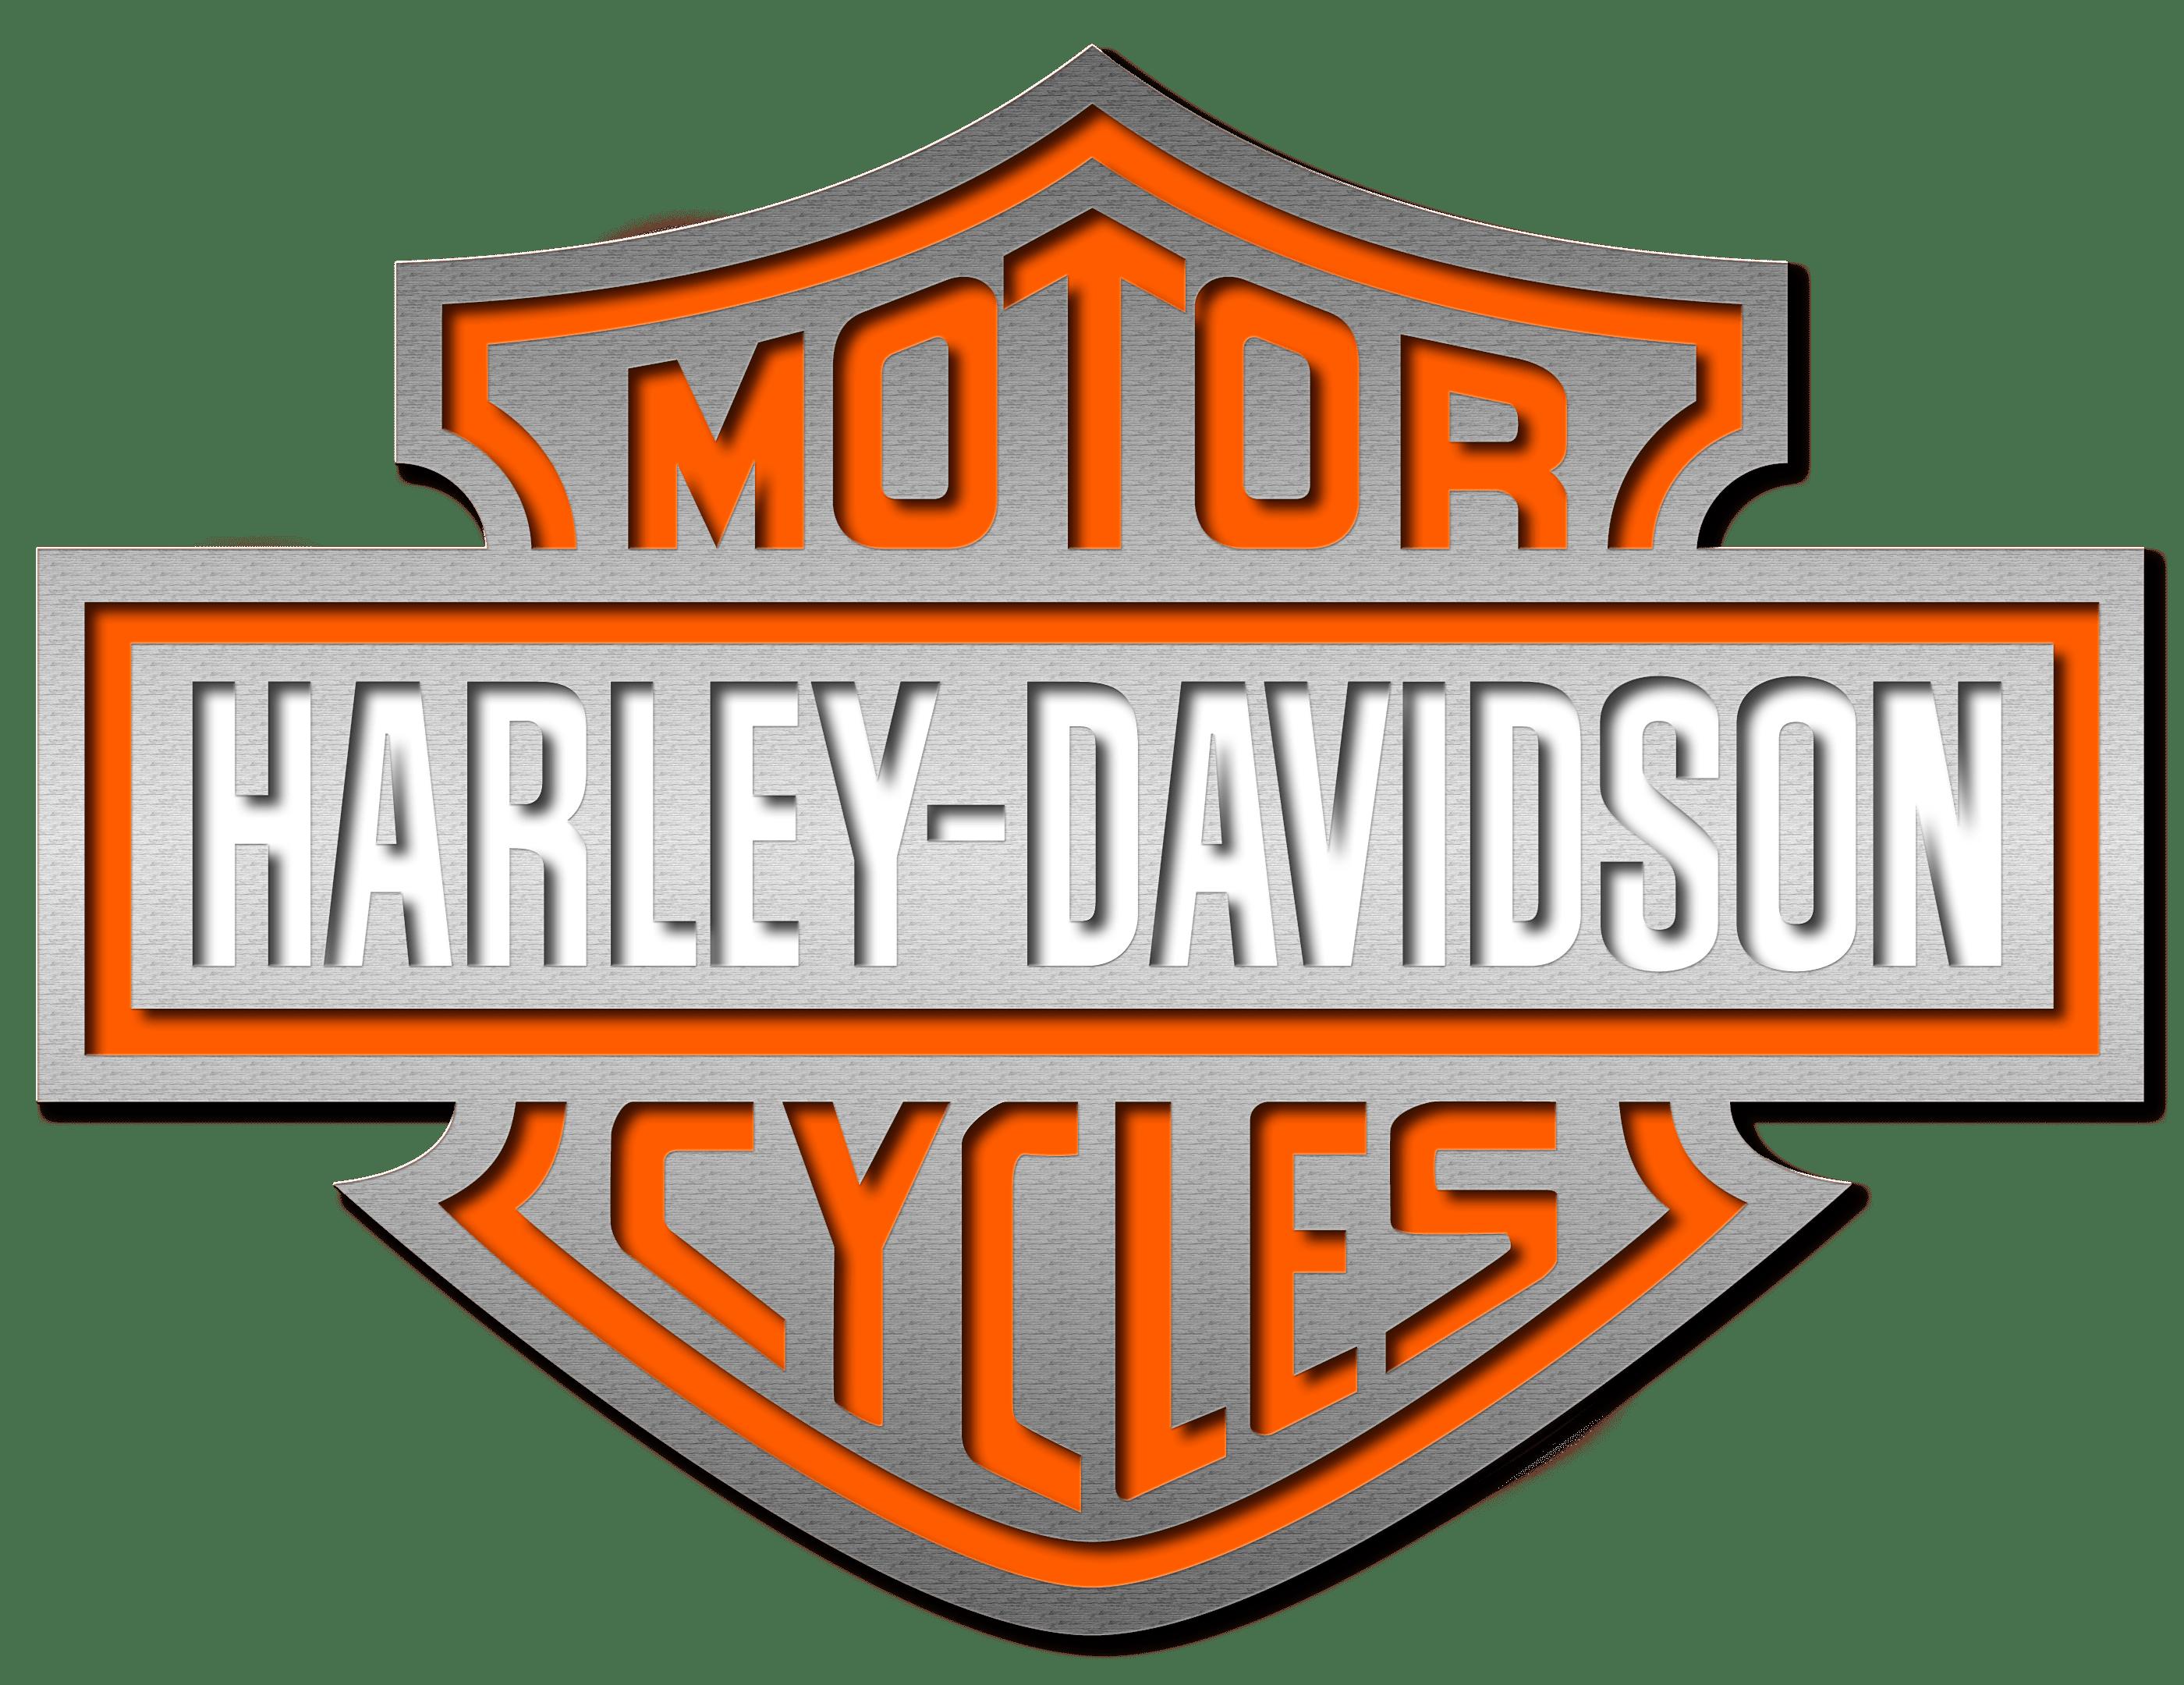 Harley Davidson Logo Harley Davidson Wallpaper Harley Davidson Logo Harley